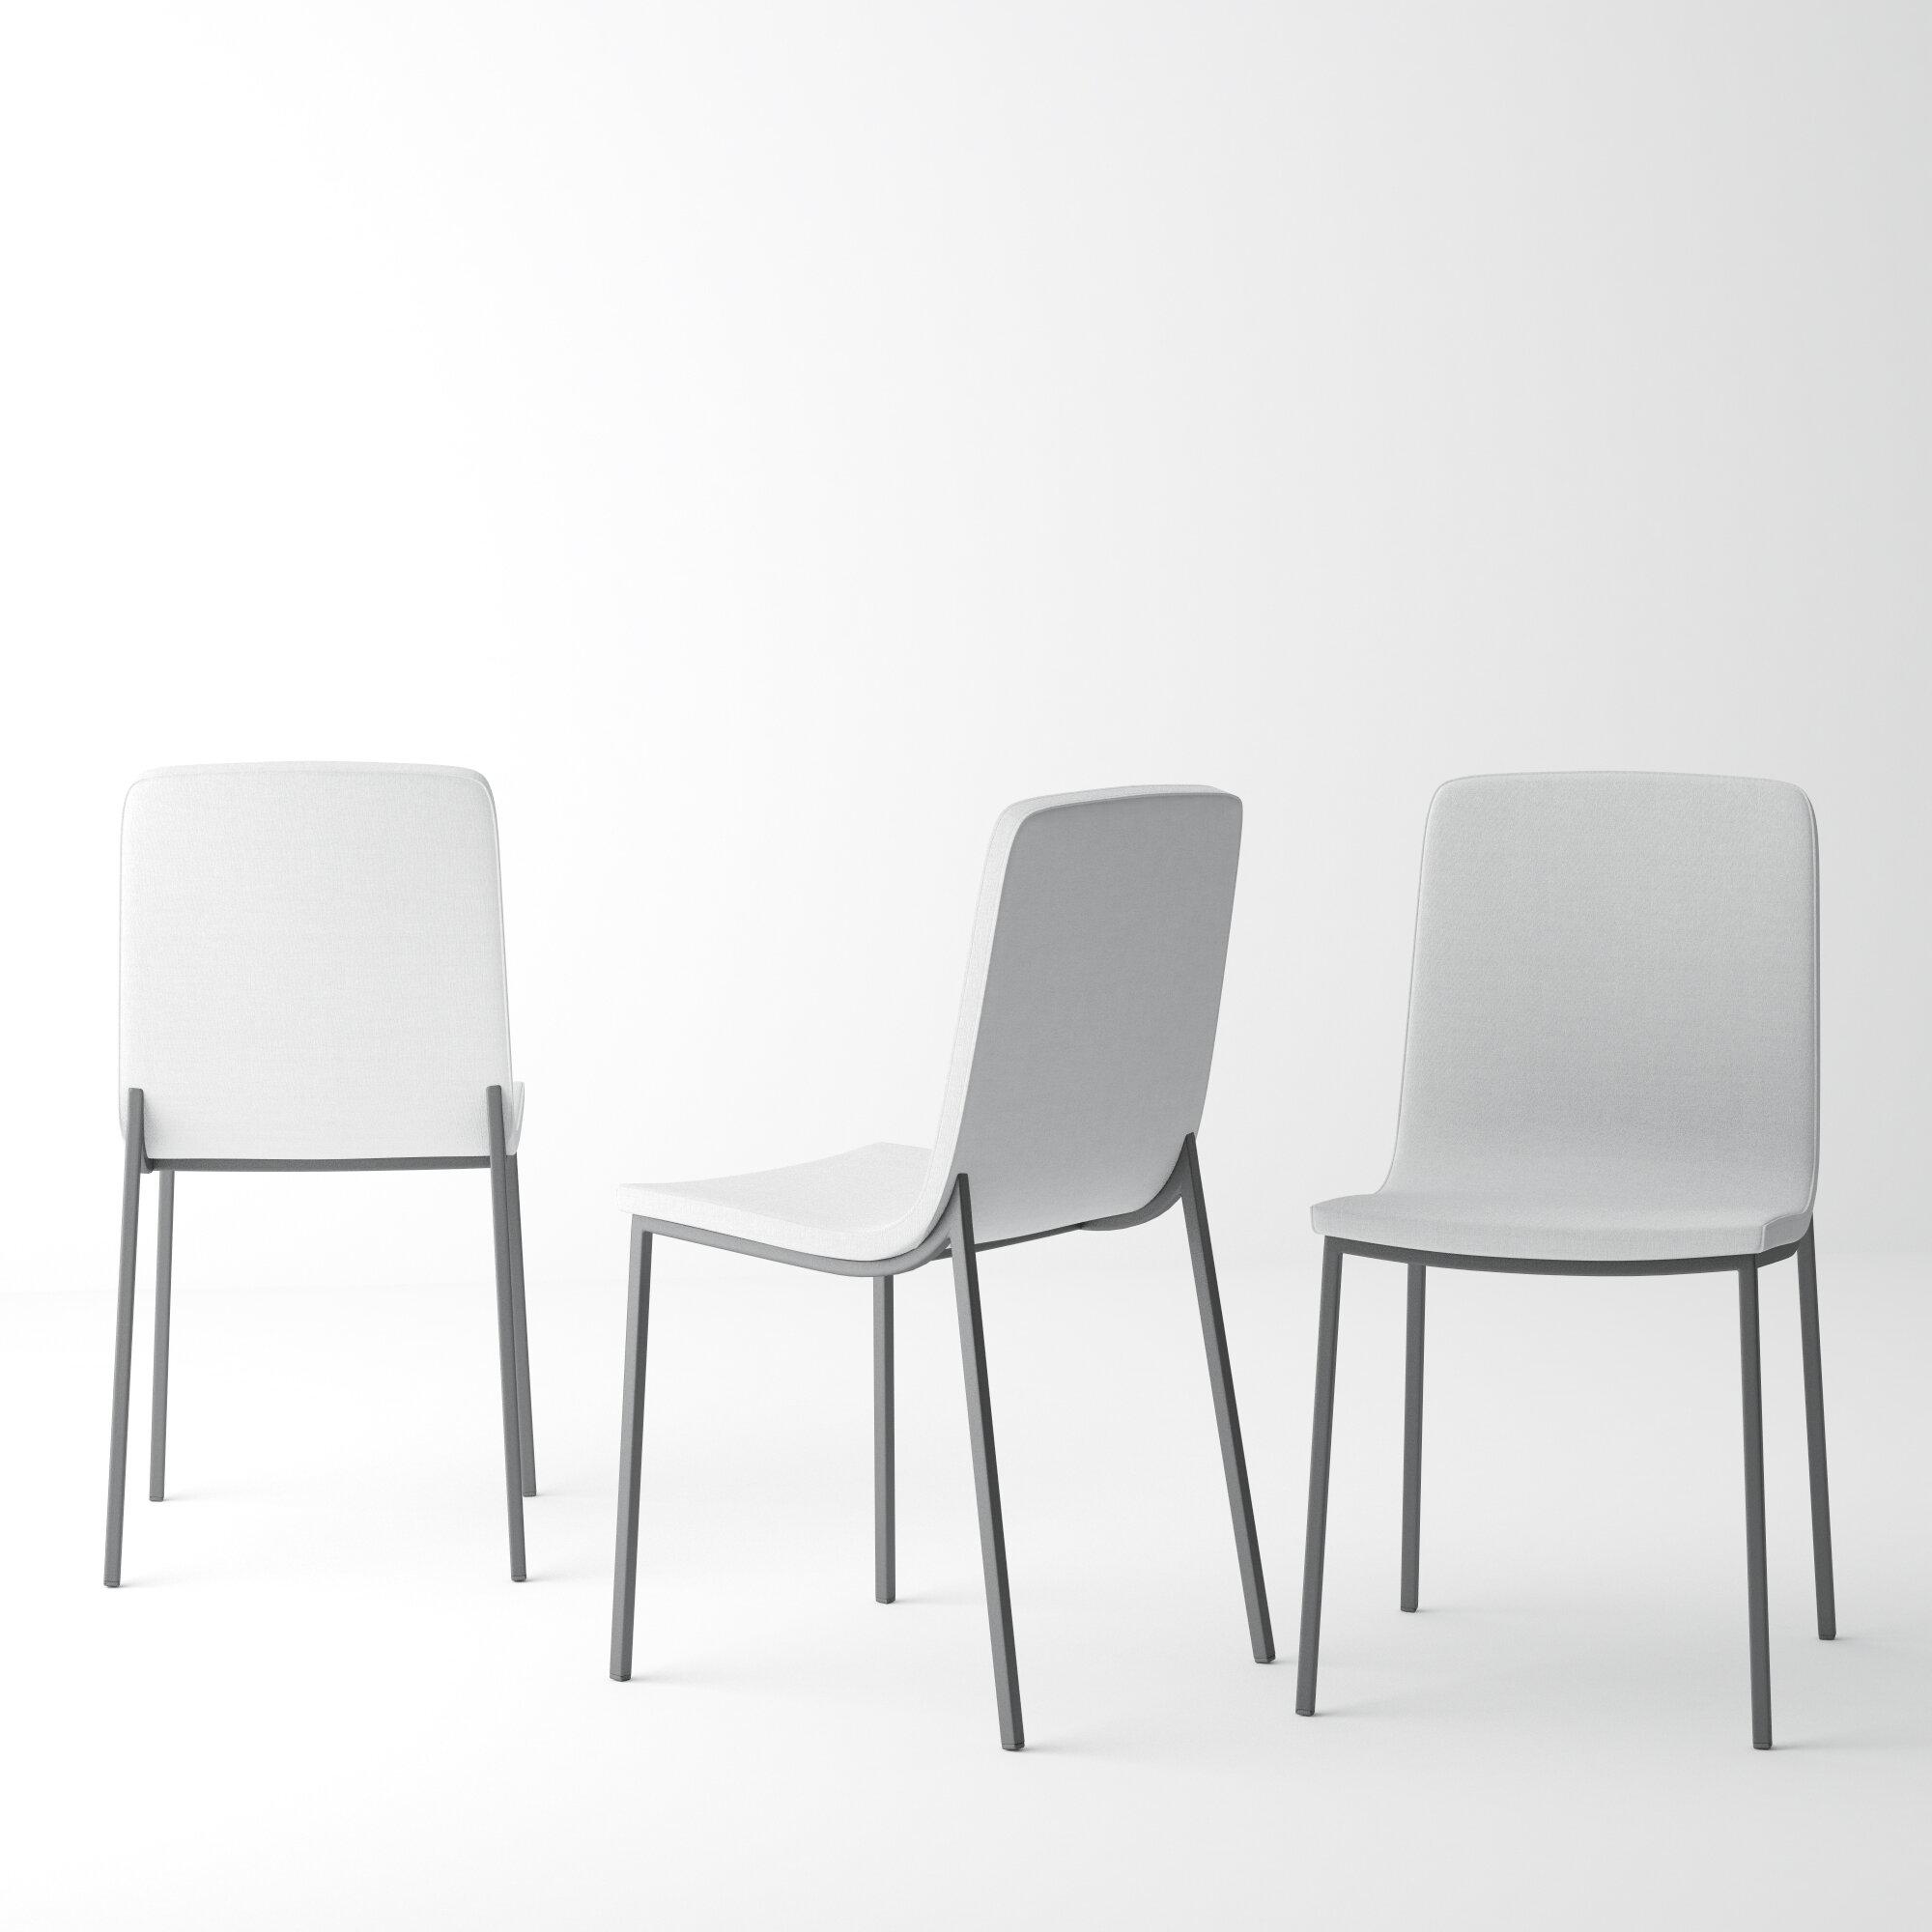 Foundry Select Avenir Upholstered Dining Chair & Reviews | Wayfair